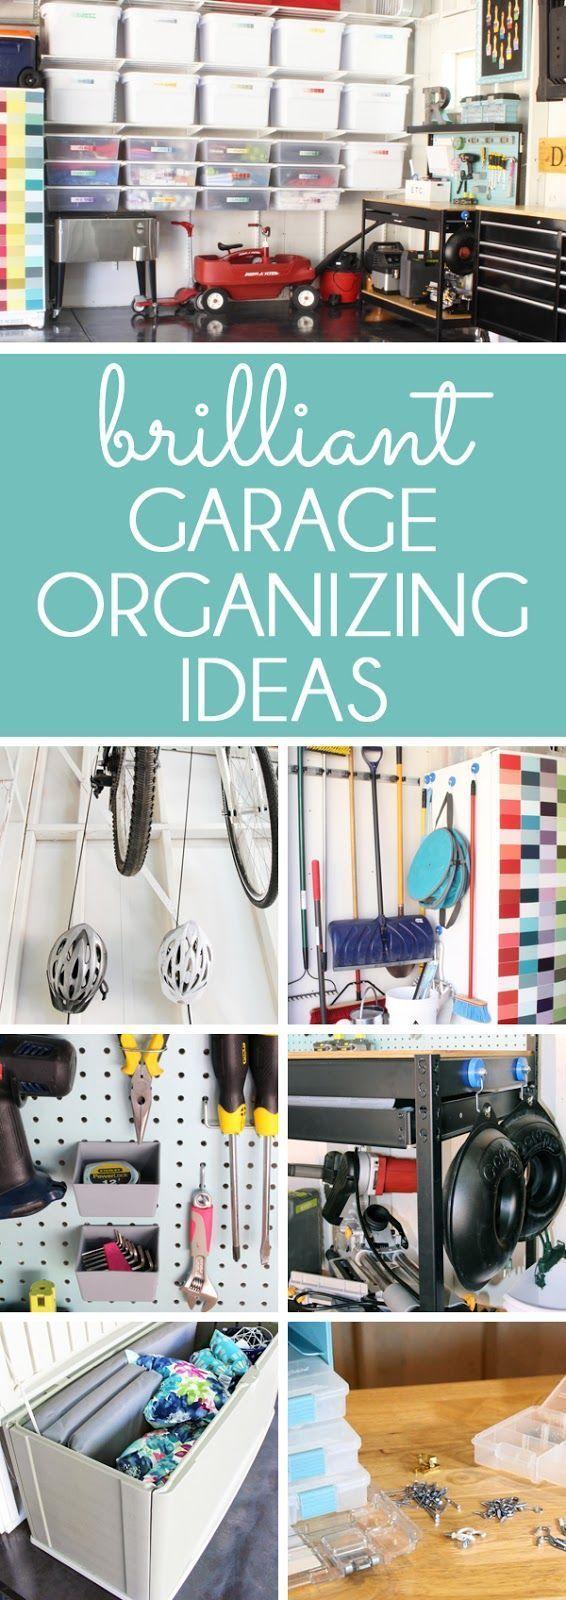 BRILLIANT GARAGE ORGANIZING IDEAS Great tips for